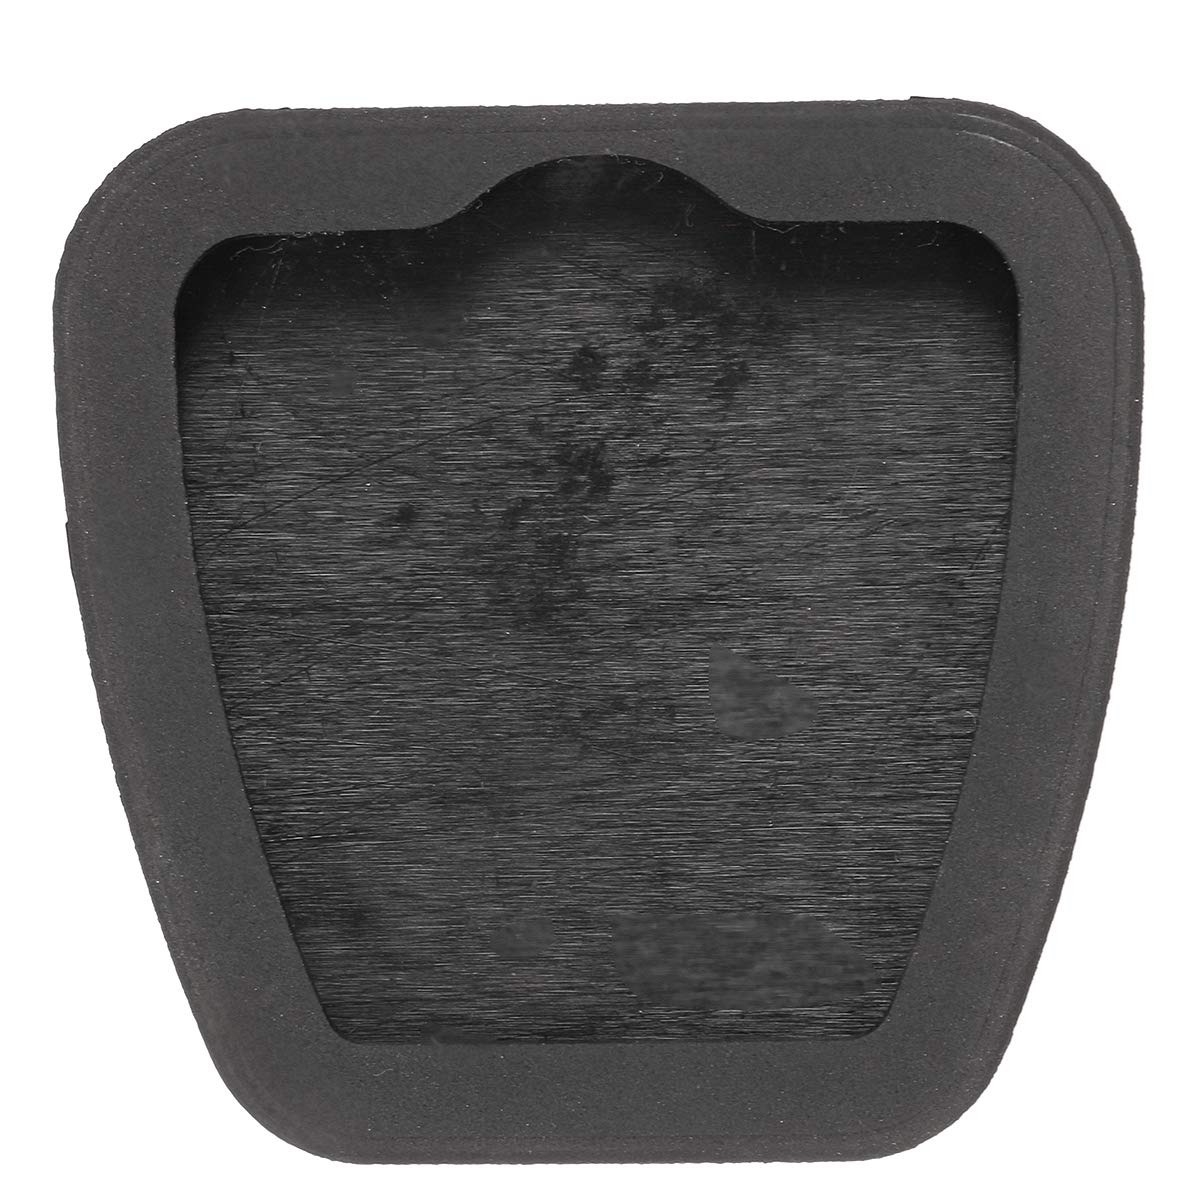 AAlamor Brake Clutch Car Pedal Pad Rubber Cover For Honda Civic Accord CR-V Prelude Acura